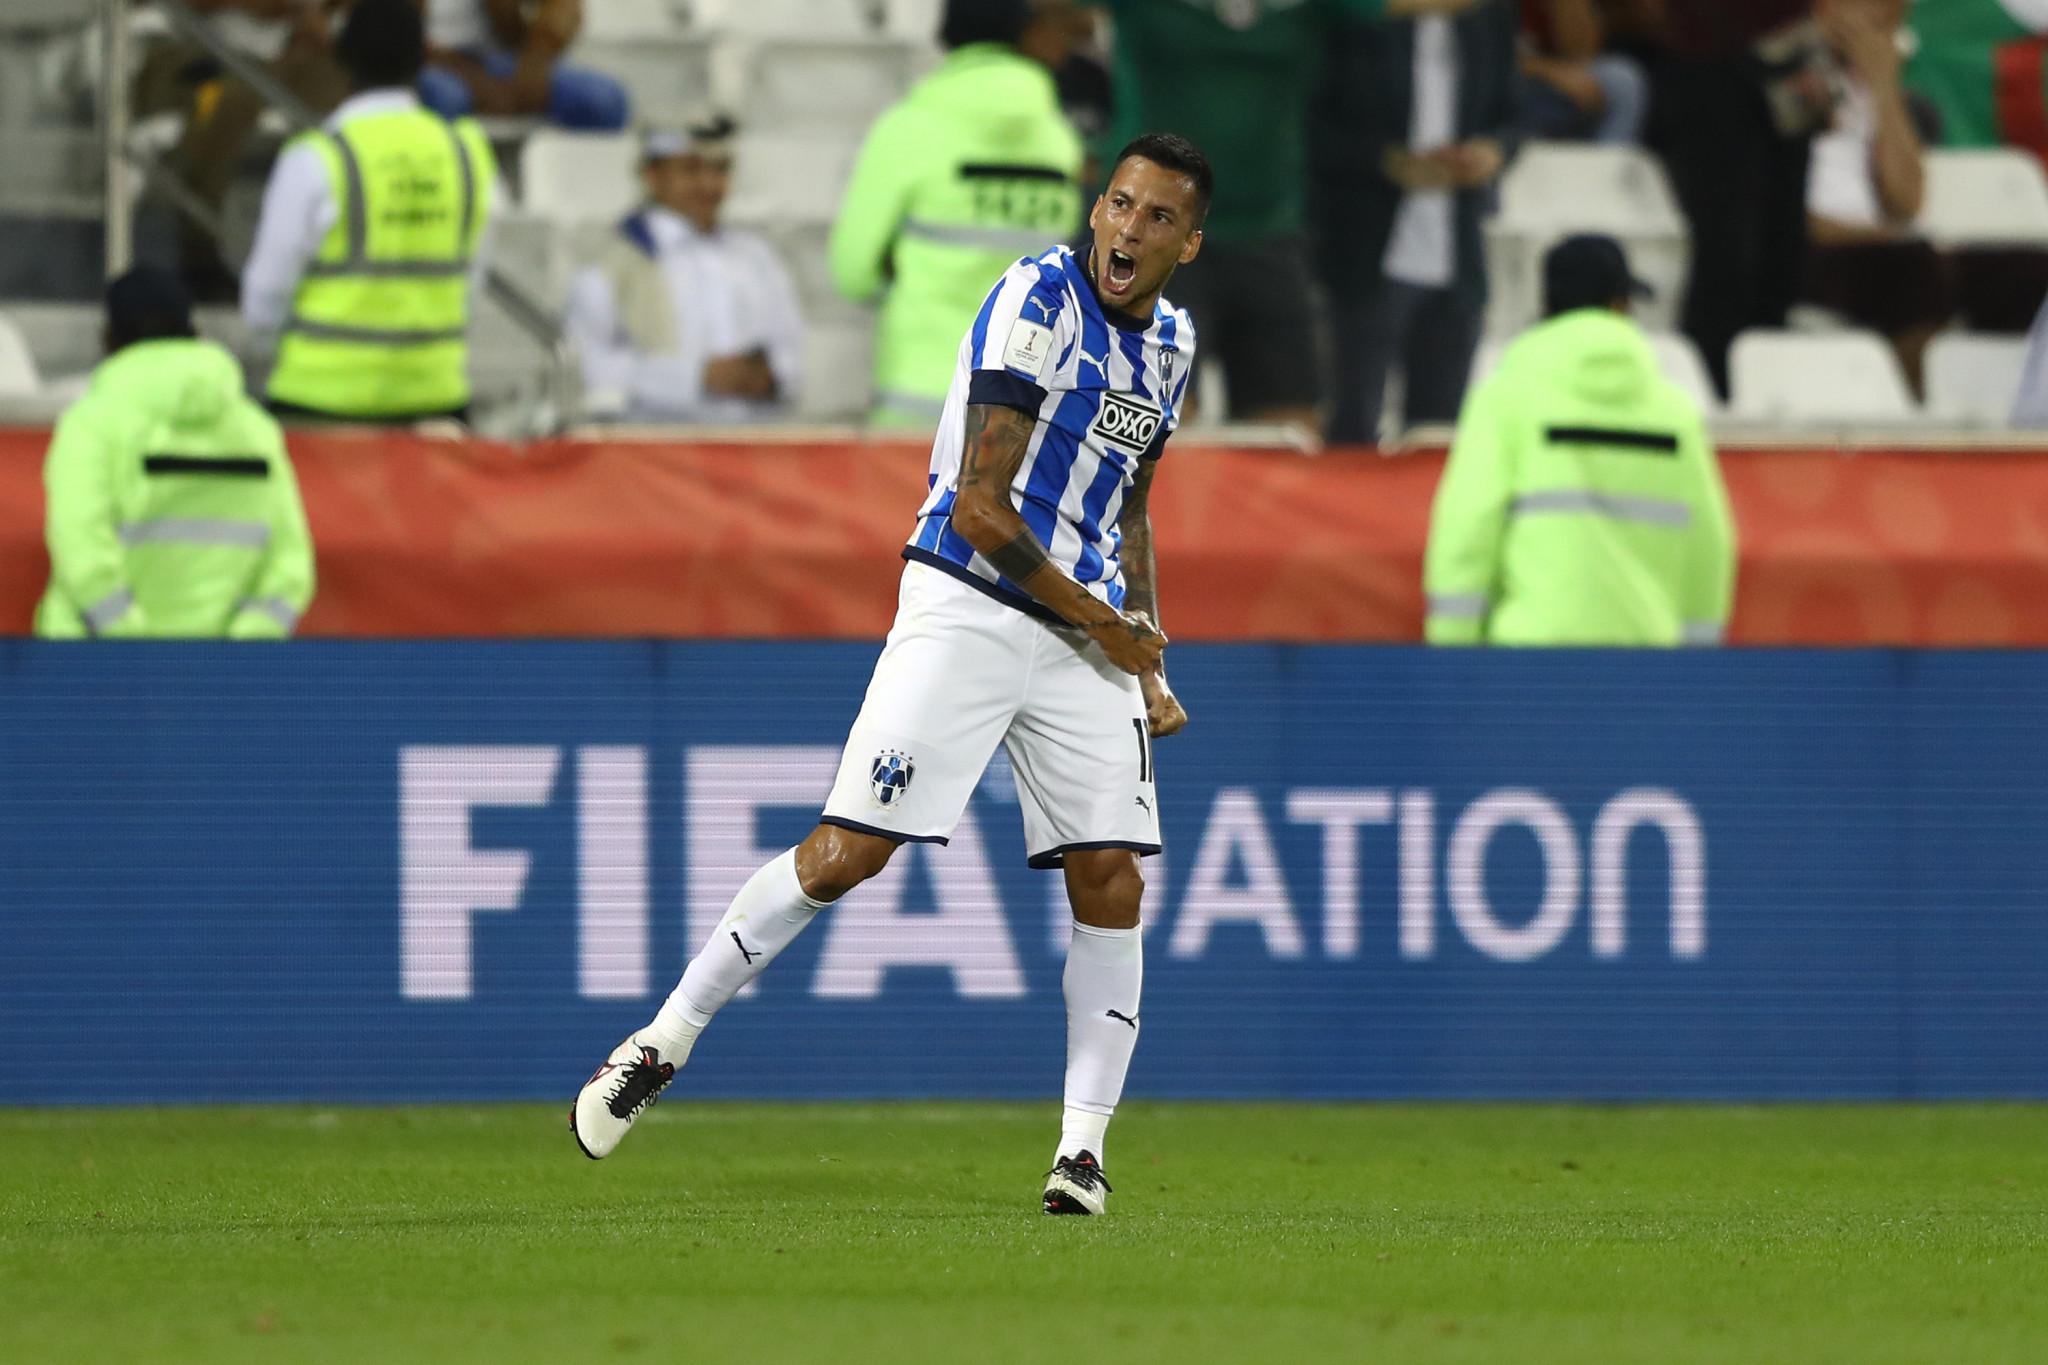 Monterrey beat Al-Sadd in thriller to reach FIFA Club World Cup last four